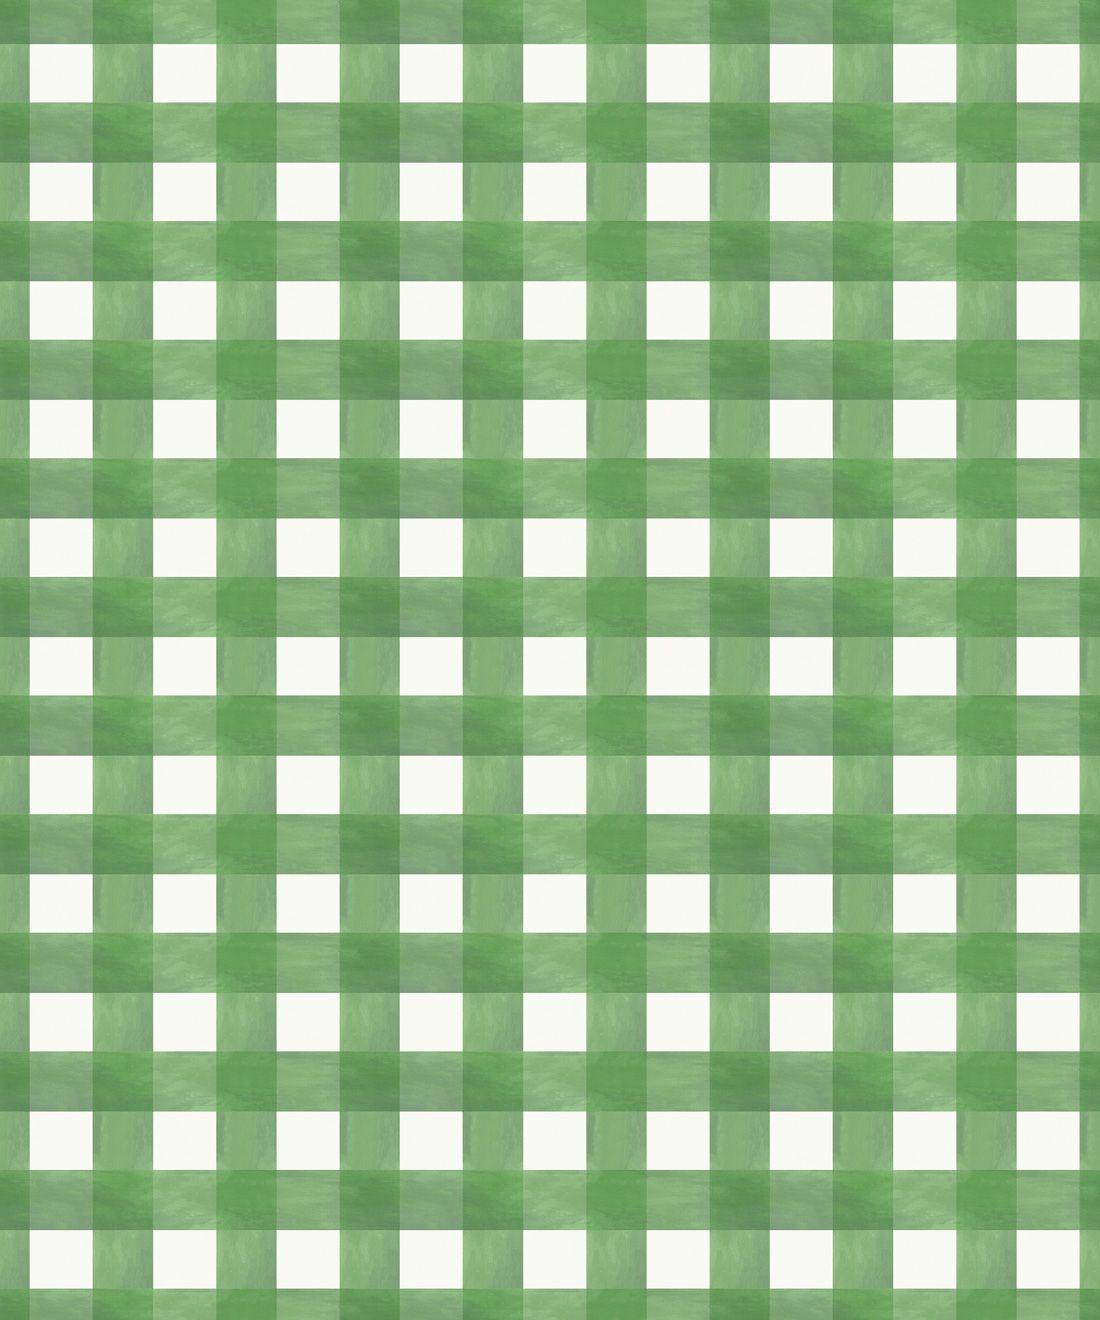 Check Wallpaper • Green •Swatch